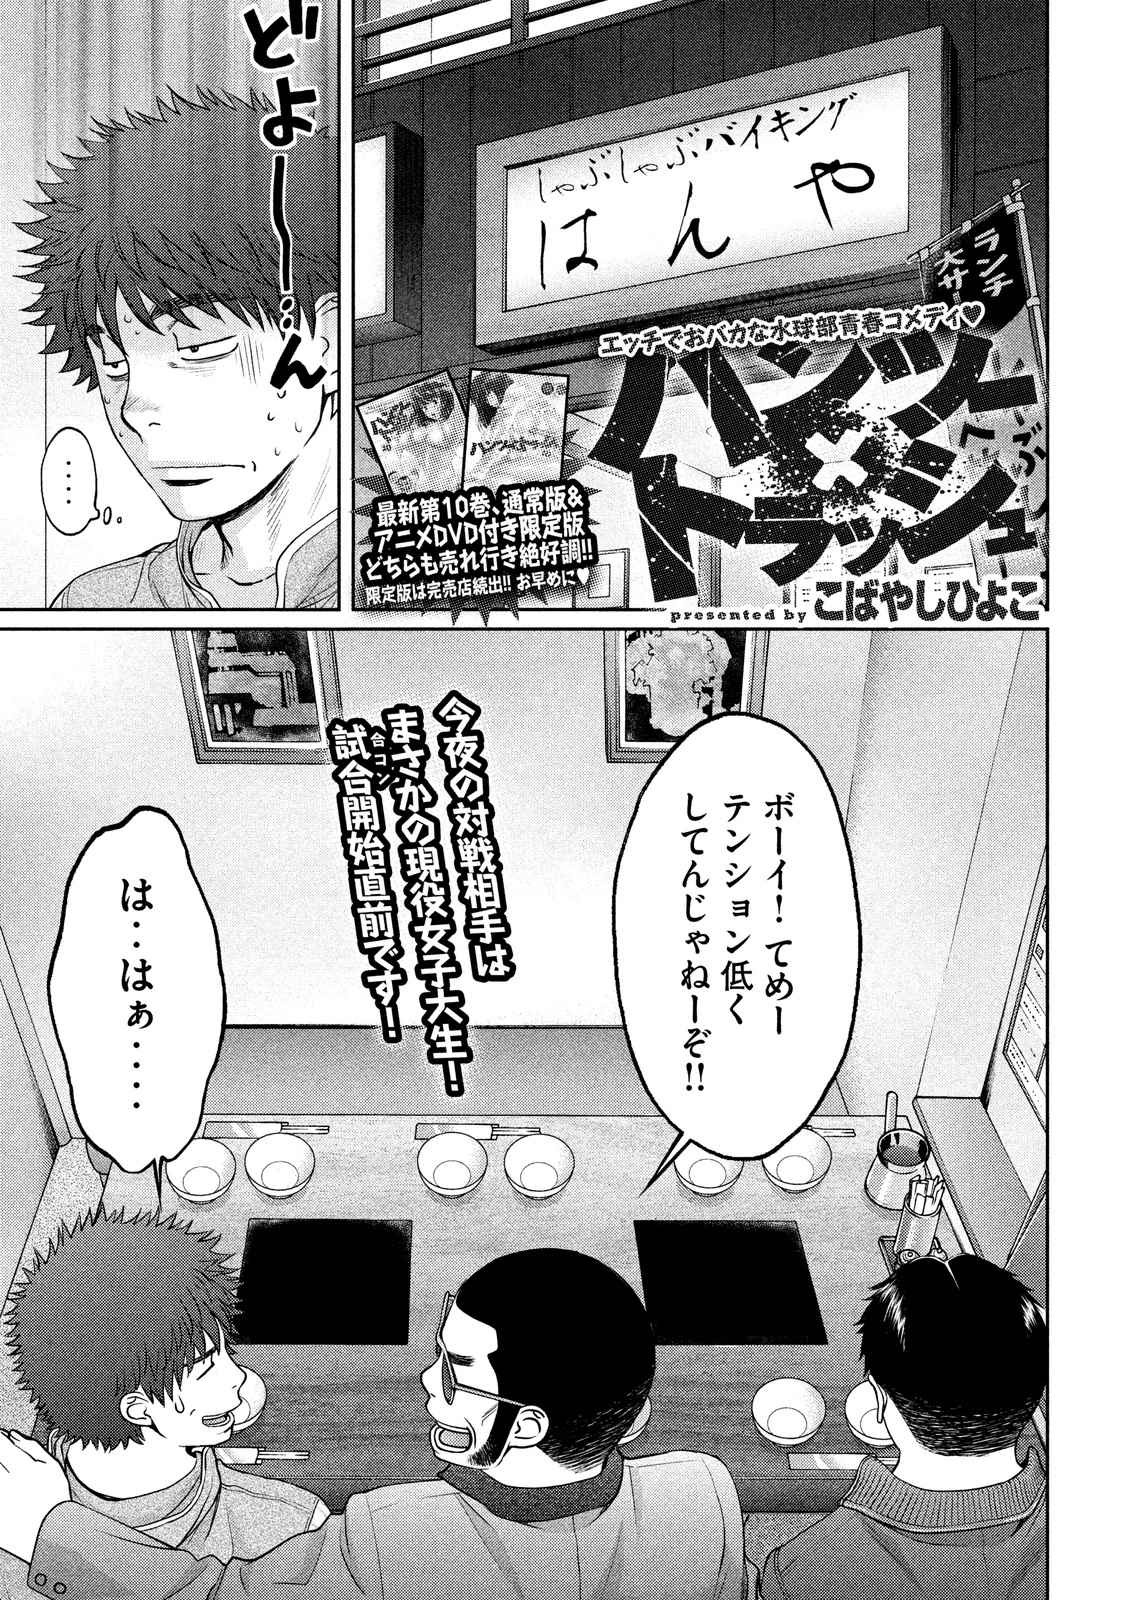 Hantsu x Trash - Chapter 121 - Page 1